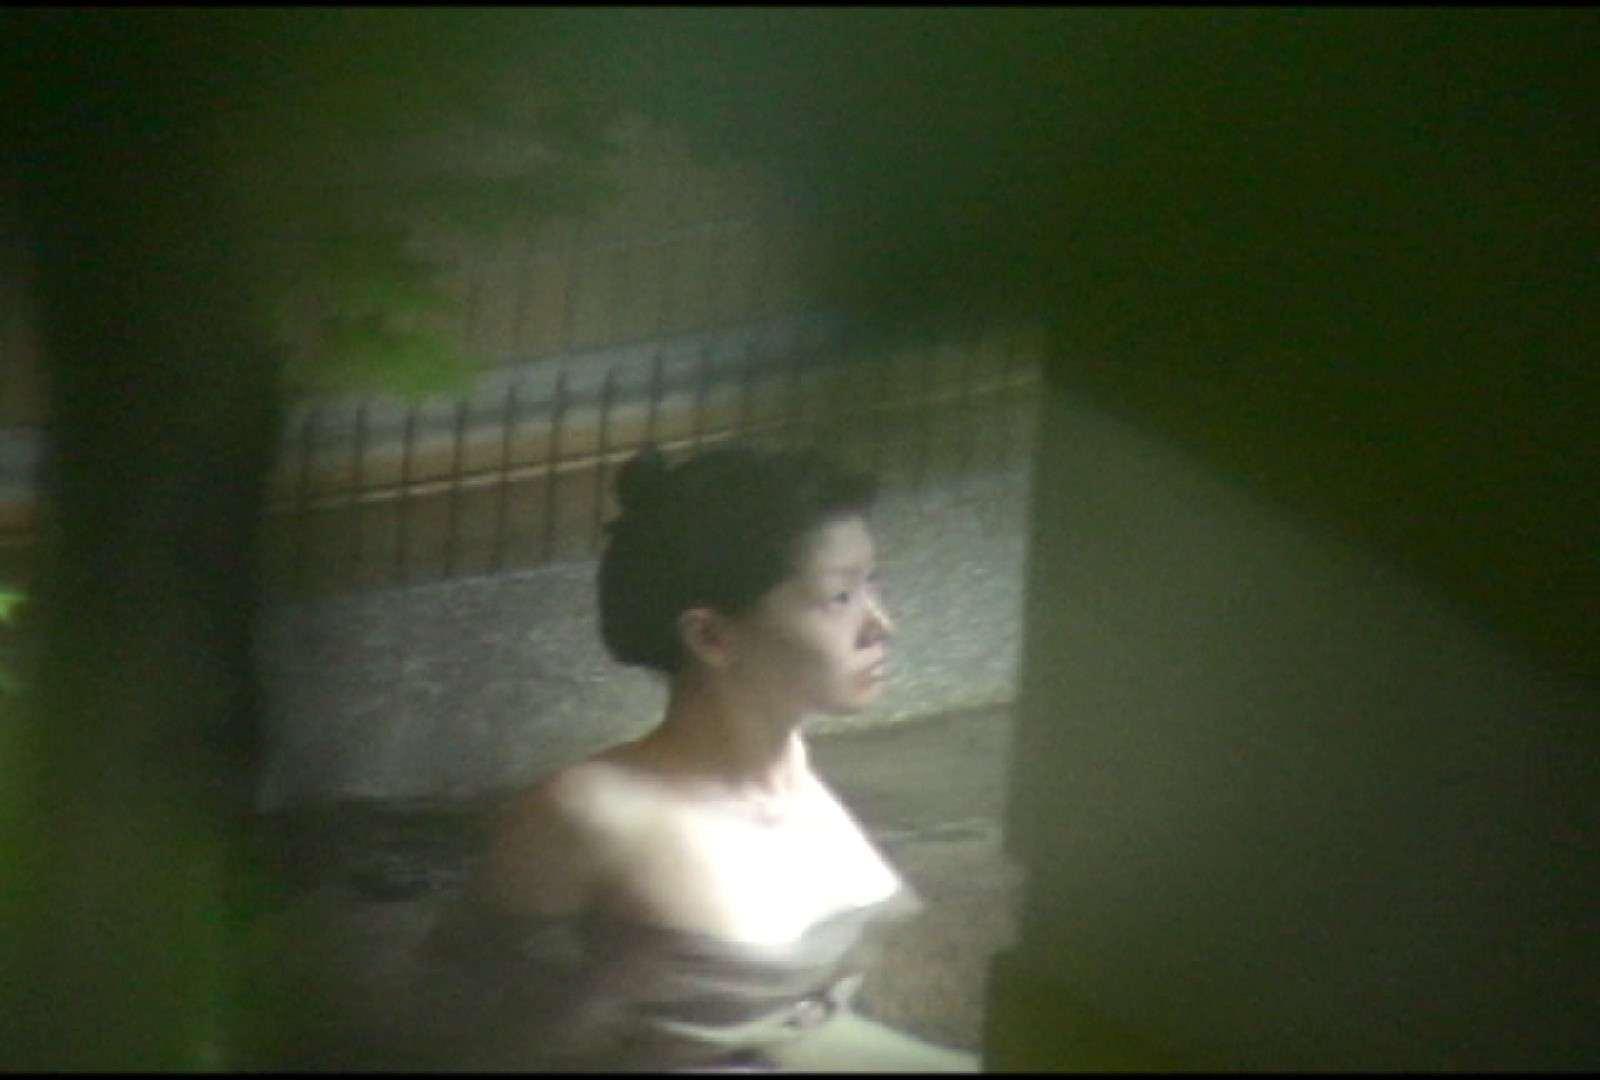 Aquaな露天風呂Vol.699 美しいOLの裸体 | 露天風呂突入  101pic 4